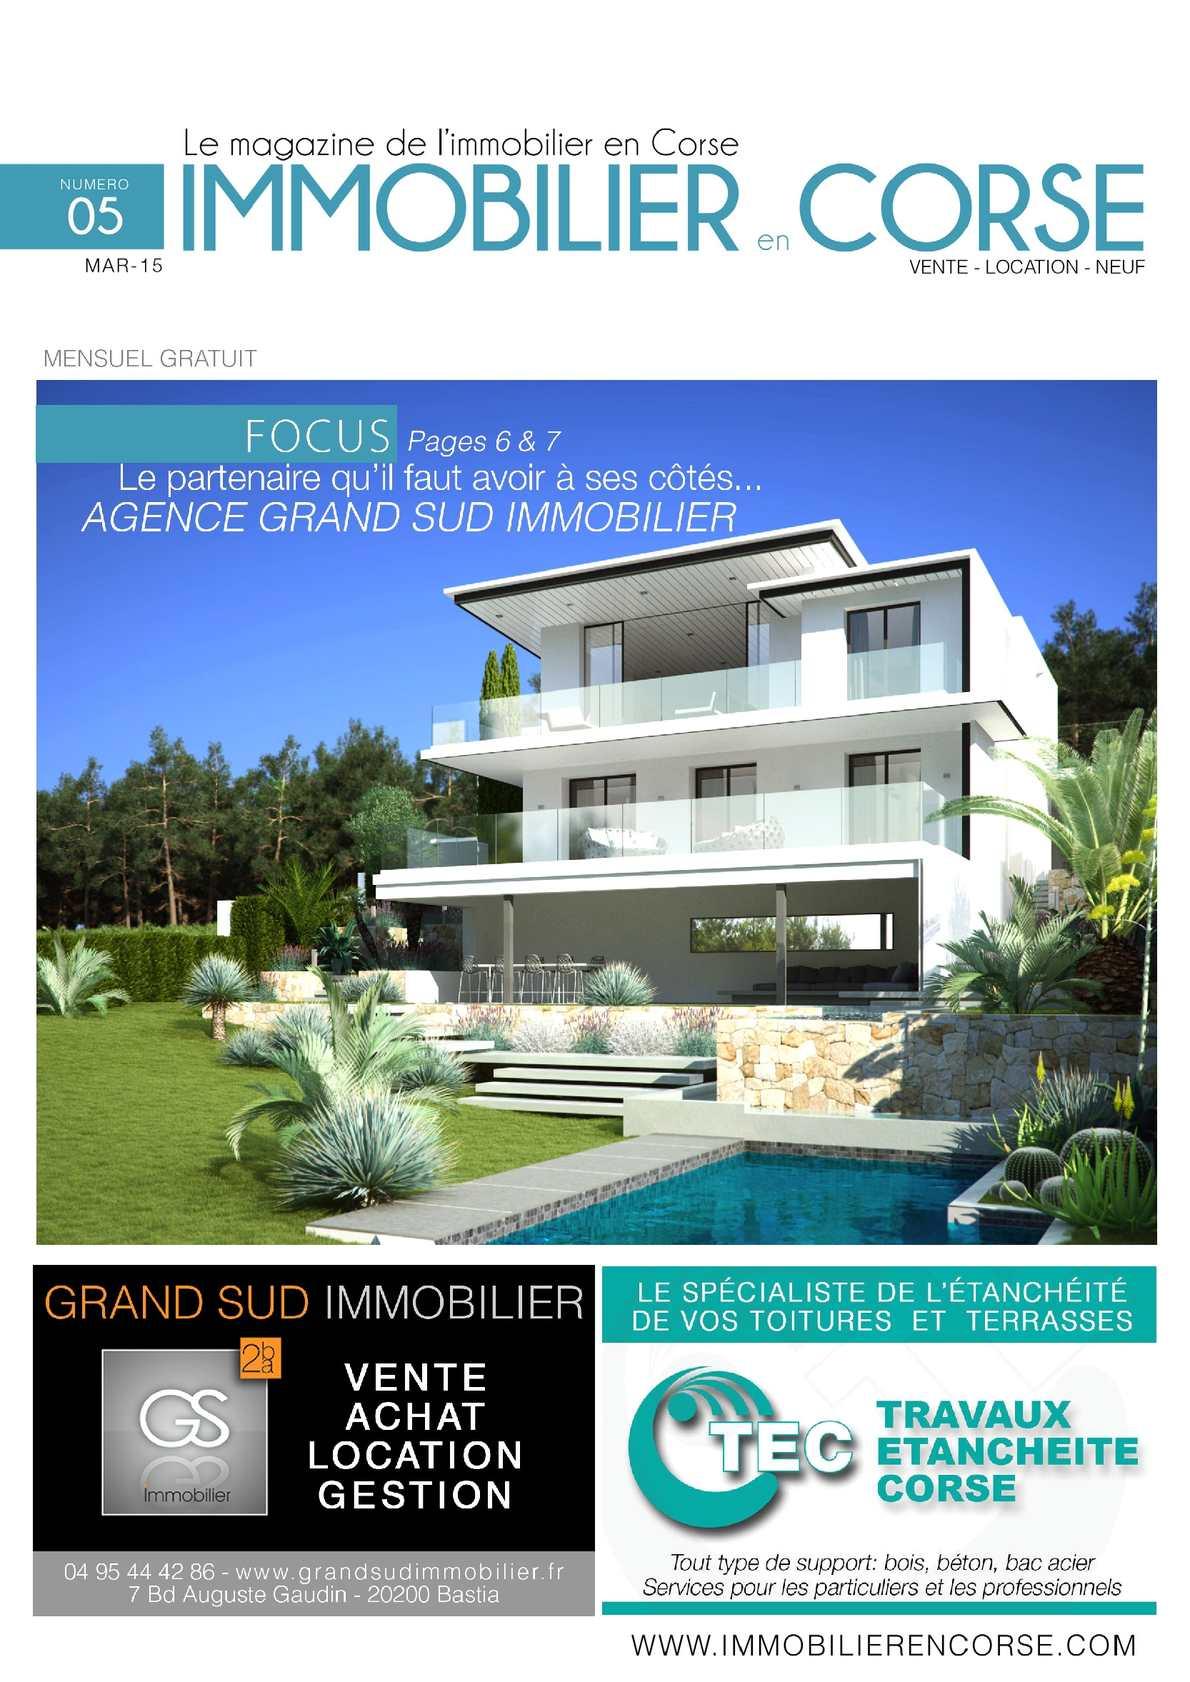 Immobilier en Corse - N°5 - Mars 2015